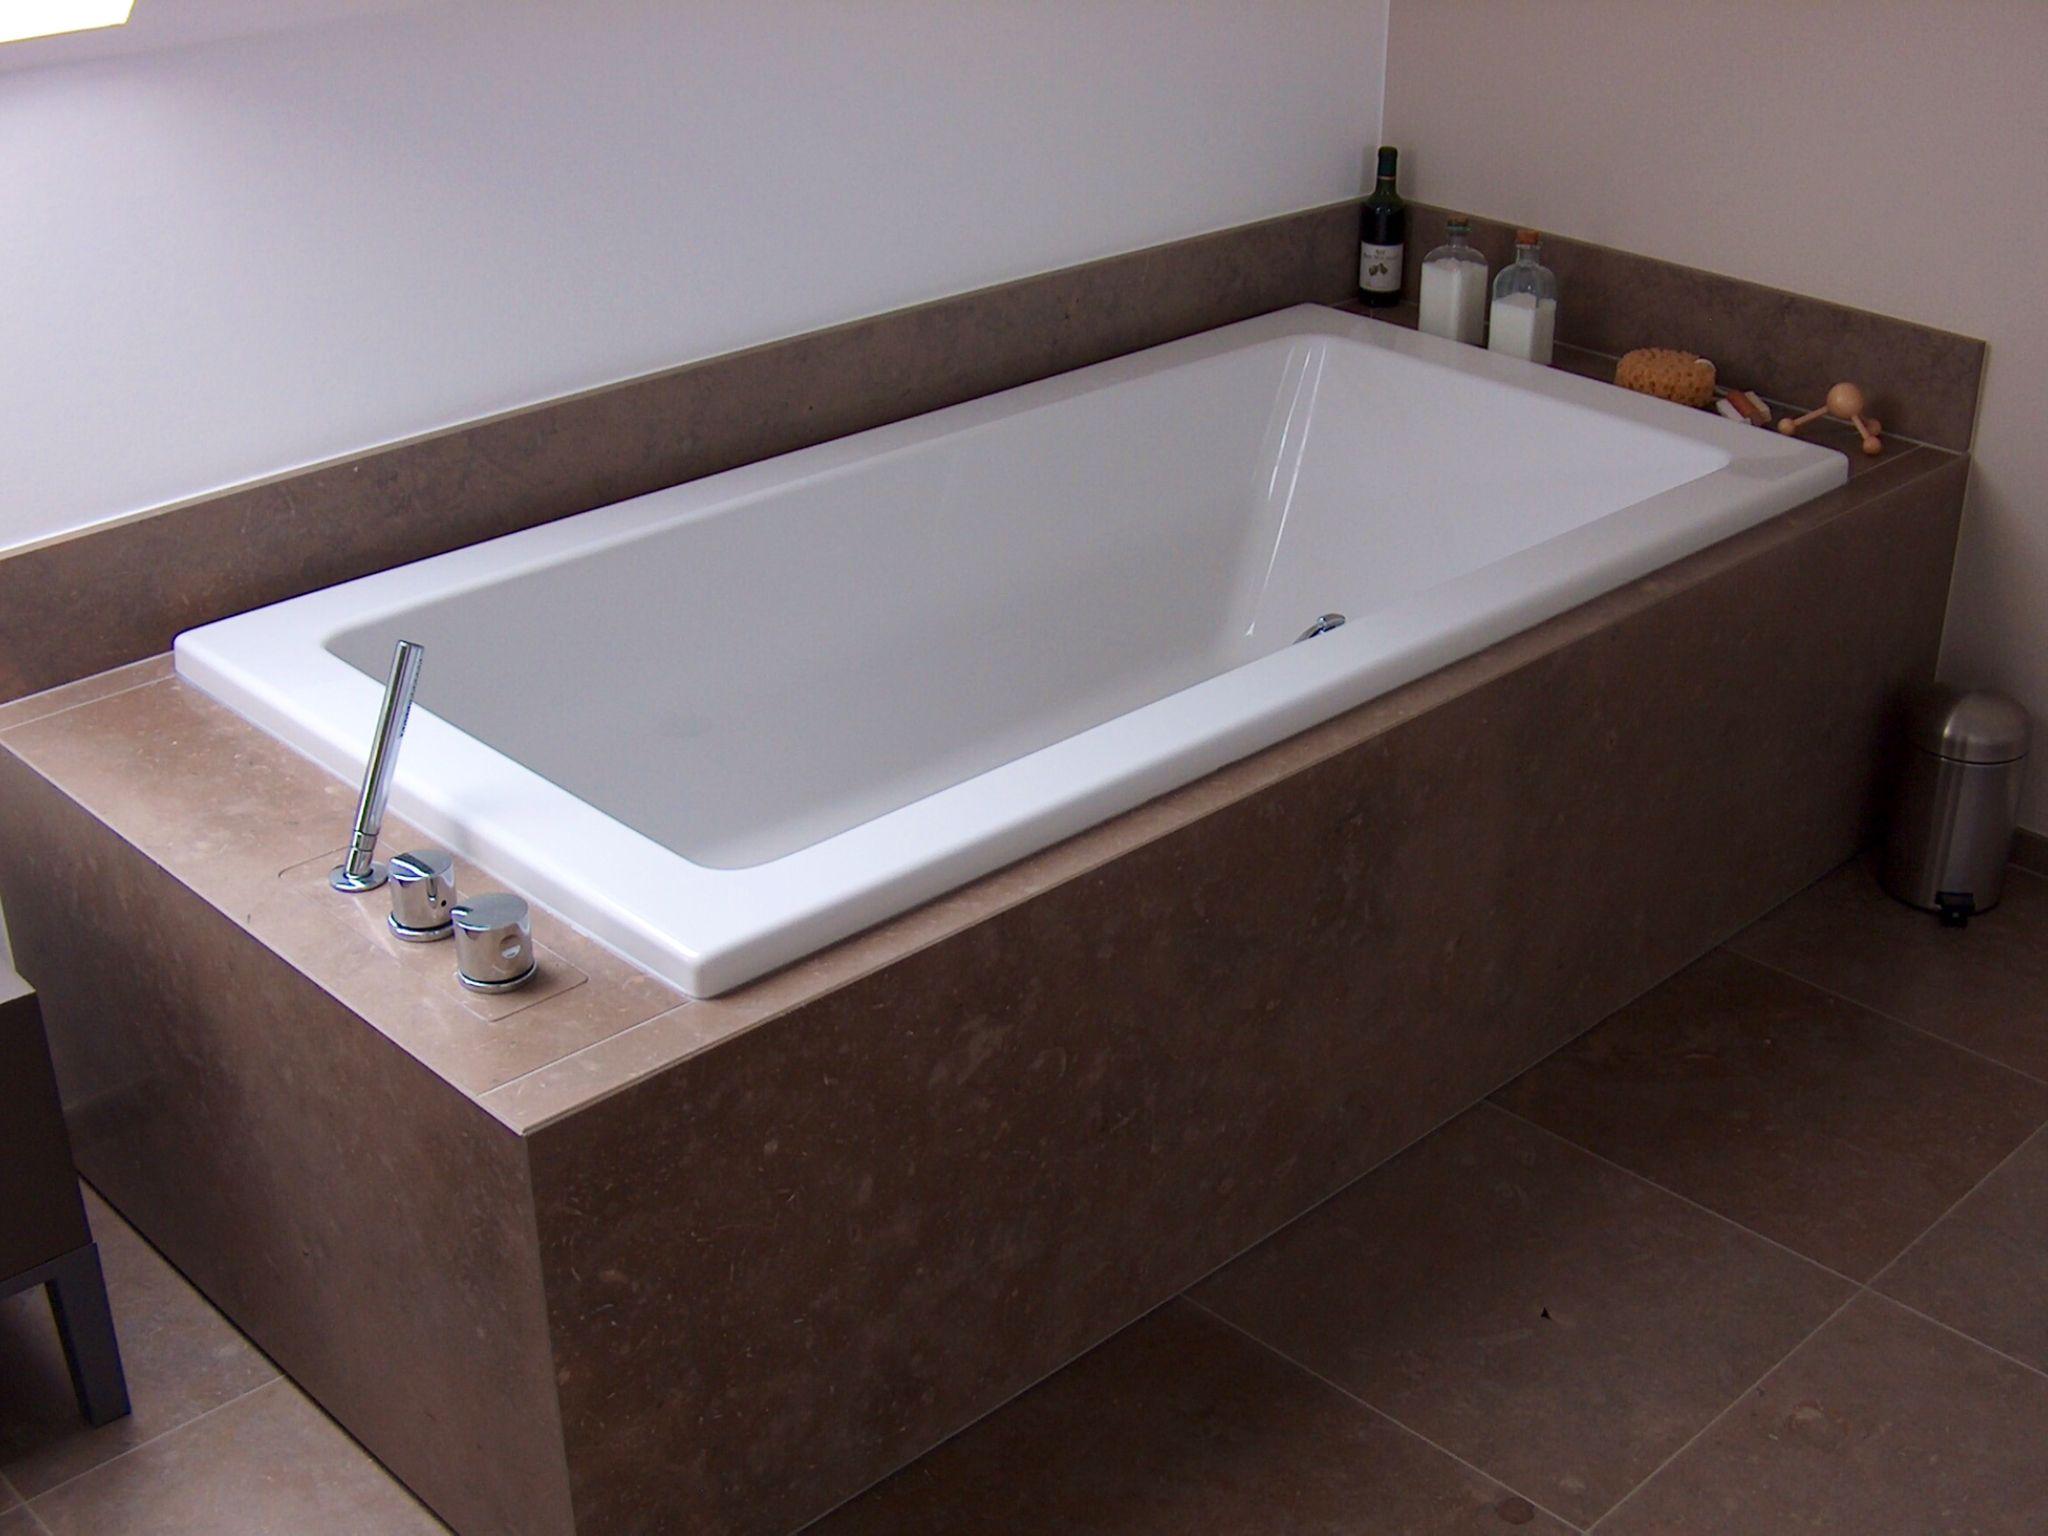 badbekleding volledig bad #badkamer - Badkamers | Pinterest ...